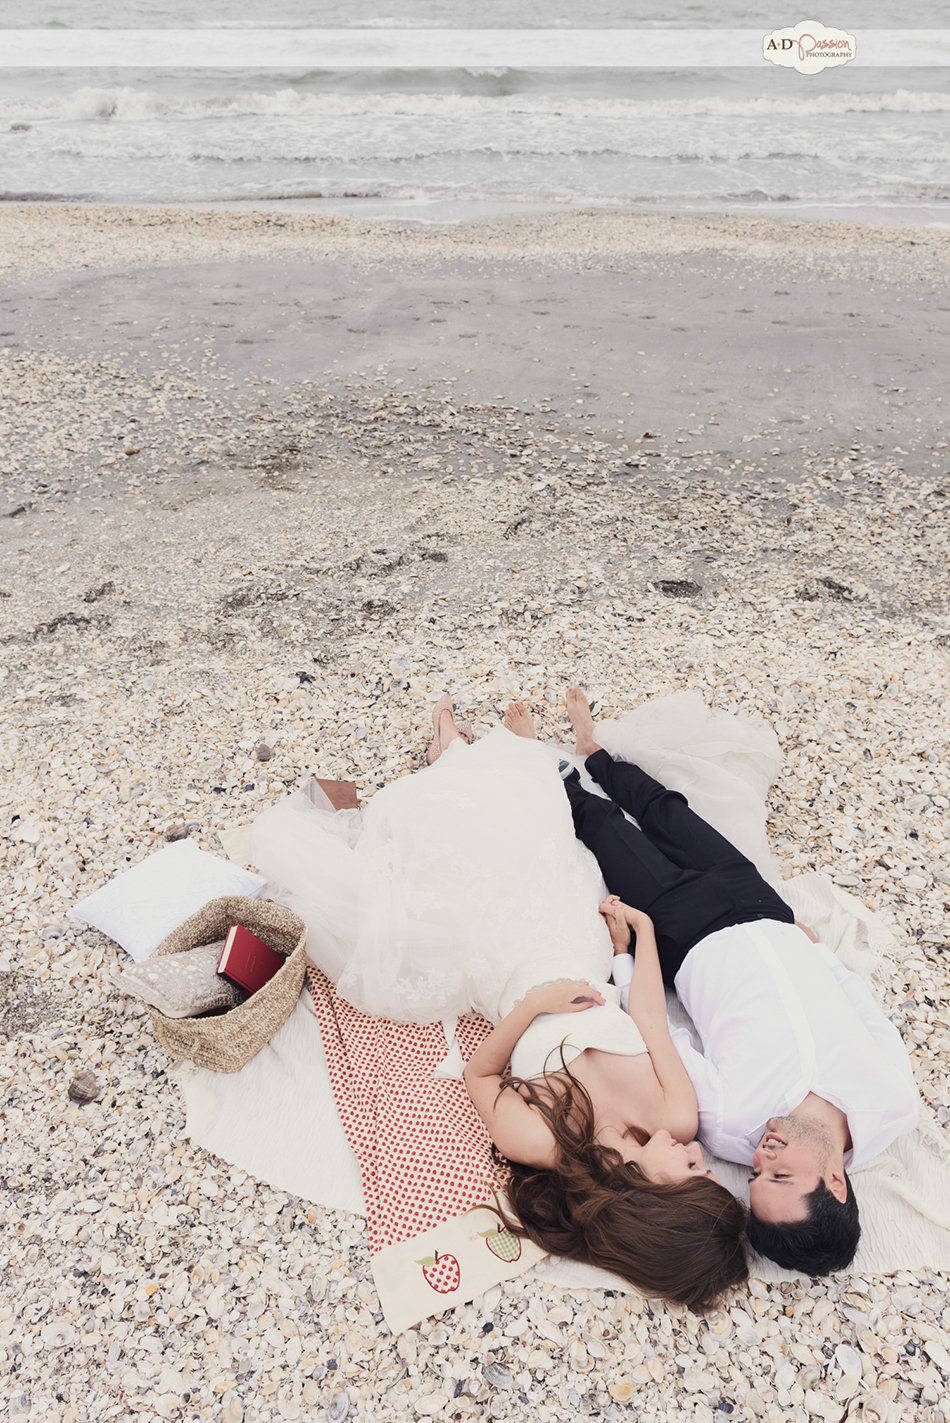 AD Passion Photography | bobo+bea_fotograf-de-nunta-bucuresti_fotografie-vintage_fotograf-profesionist_after-wedding_0057 | Adelin, Dida, fotograf profesionist, fotograf de nunta, fotografie de nunta, fotograf Timisoara, fotograf Craiova, fotograf Bucuresti, fotograf Arad, nunta Timisoara, nunta Arad, nunta Bucuresti, nunta Craiova